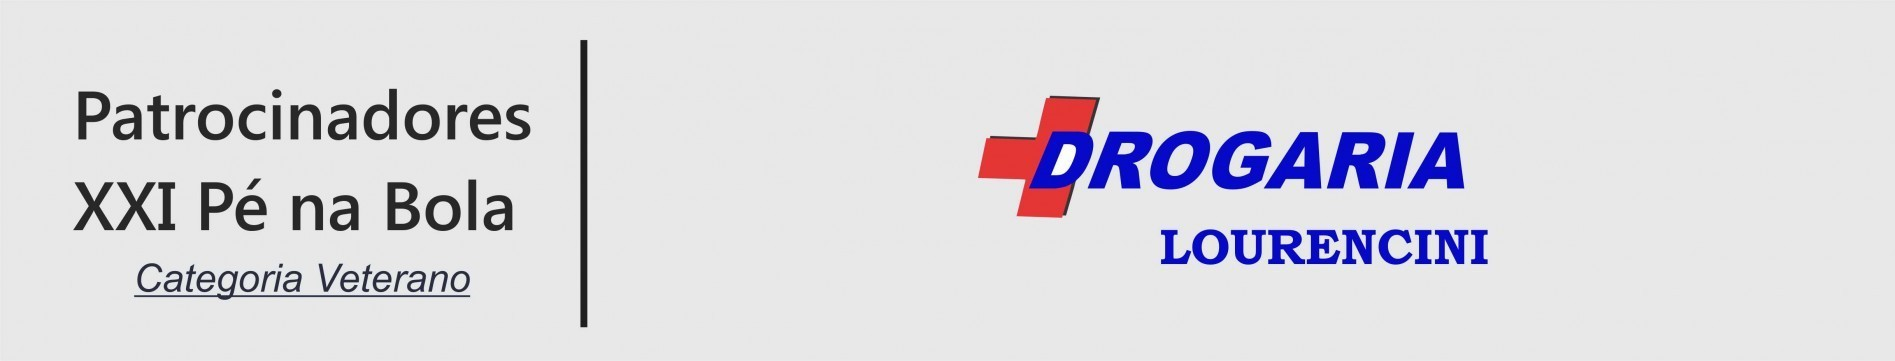 uploads/multimidia/20180626062420-drogaria.jpg